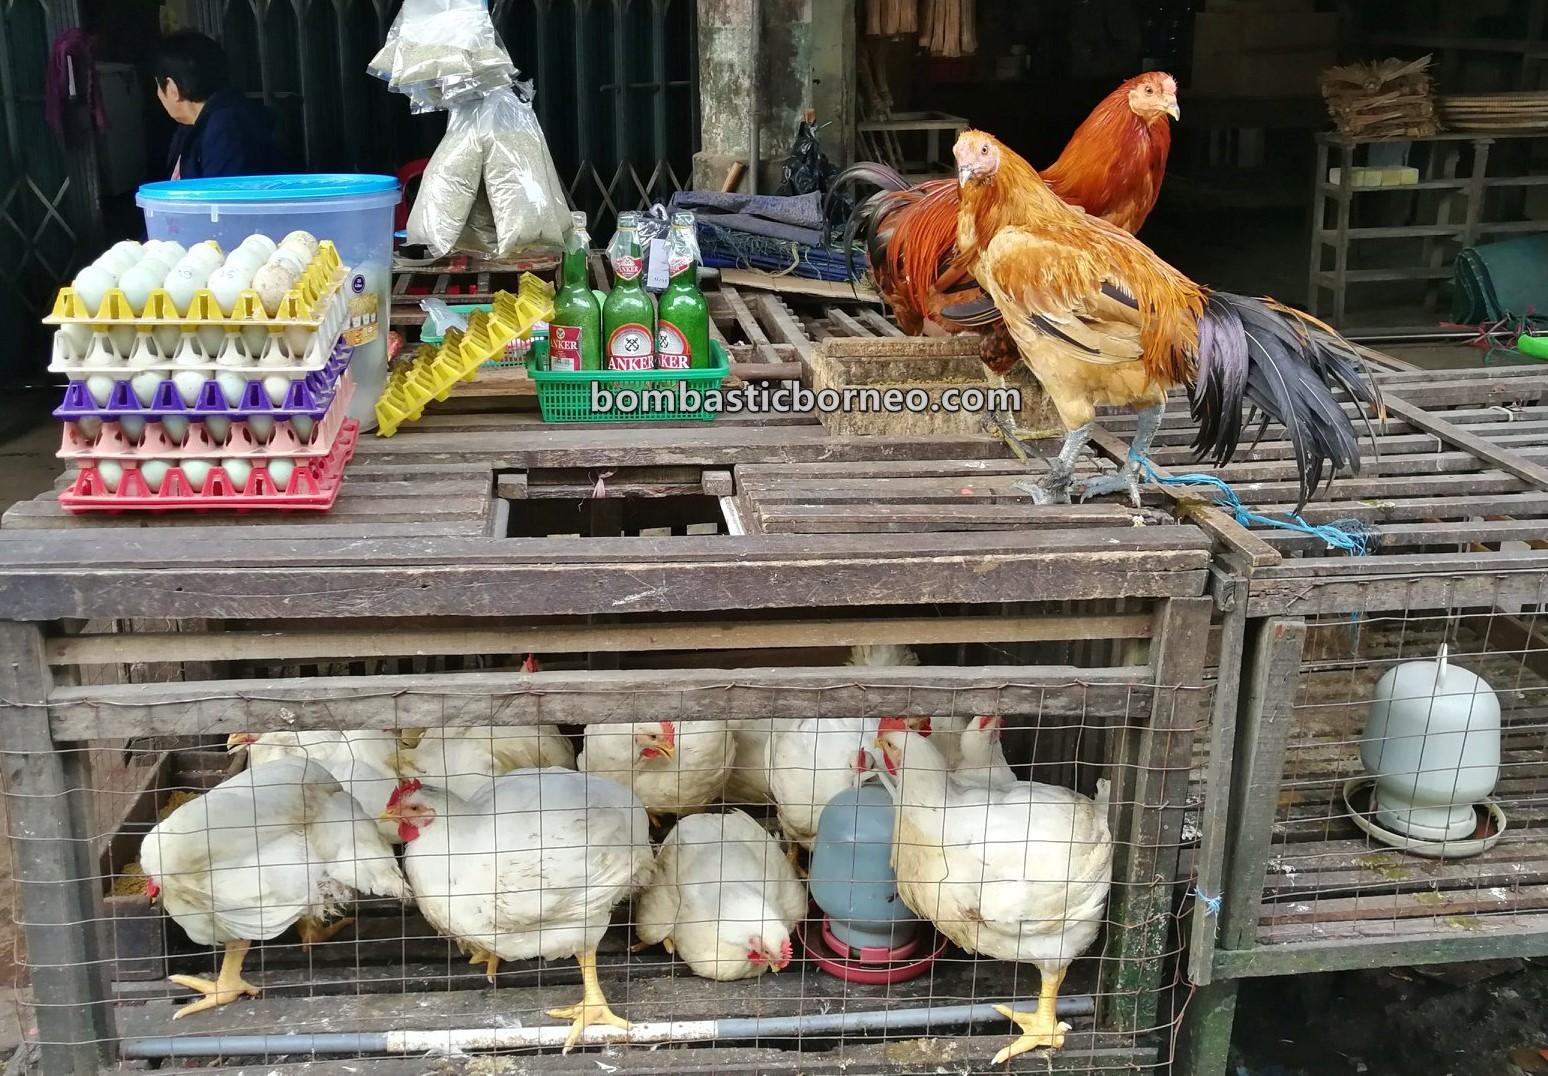 Morning Market, authentic, traditional, destination, Indonesia, West Kalimantan, Kota Amoi, fish, Obyek wisata, Tourism, Borneo, 探索婆罗洲游踪, 印尼西加里曼丹, 山口洋早市